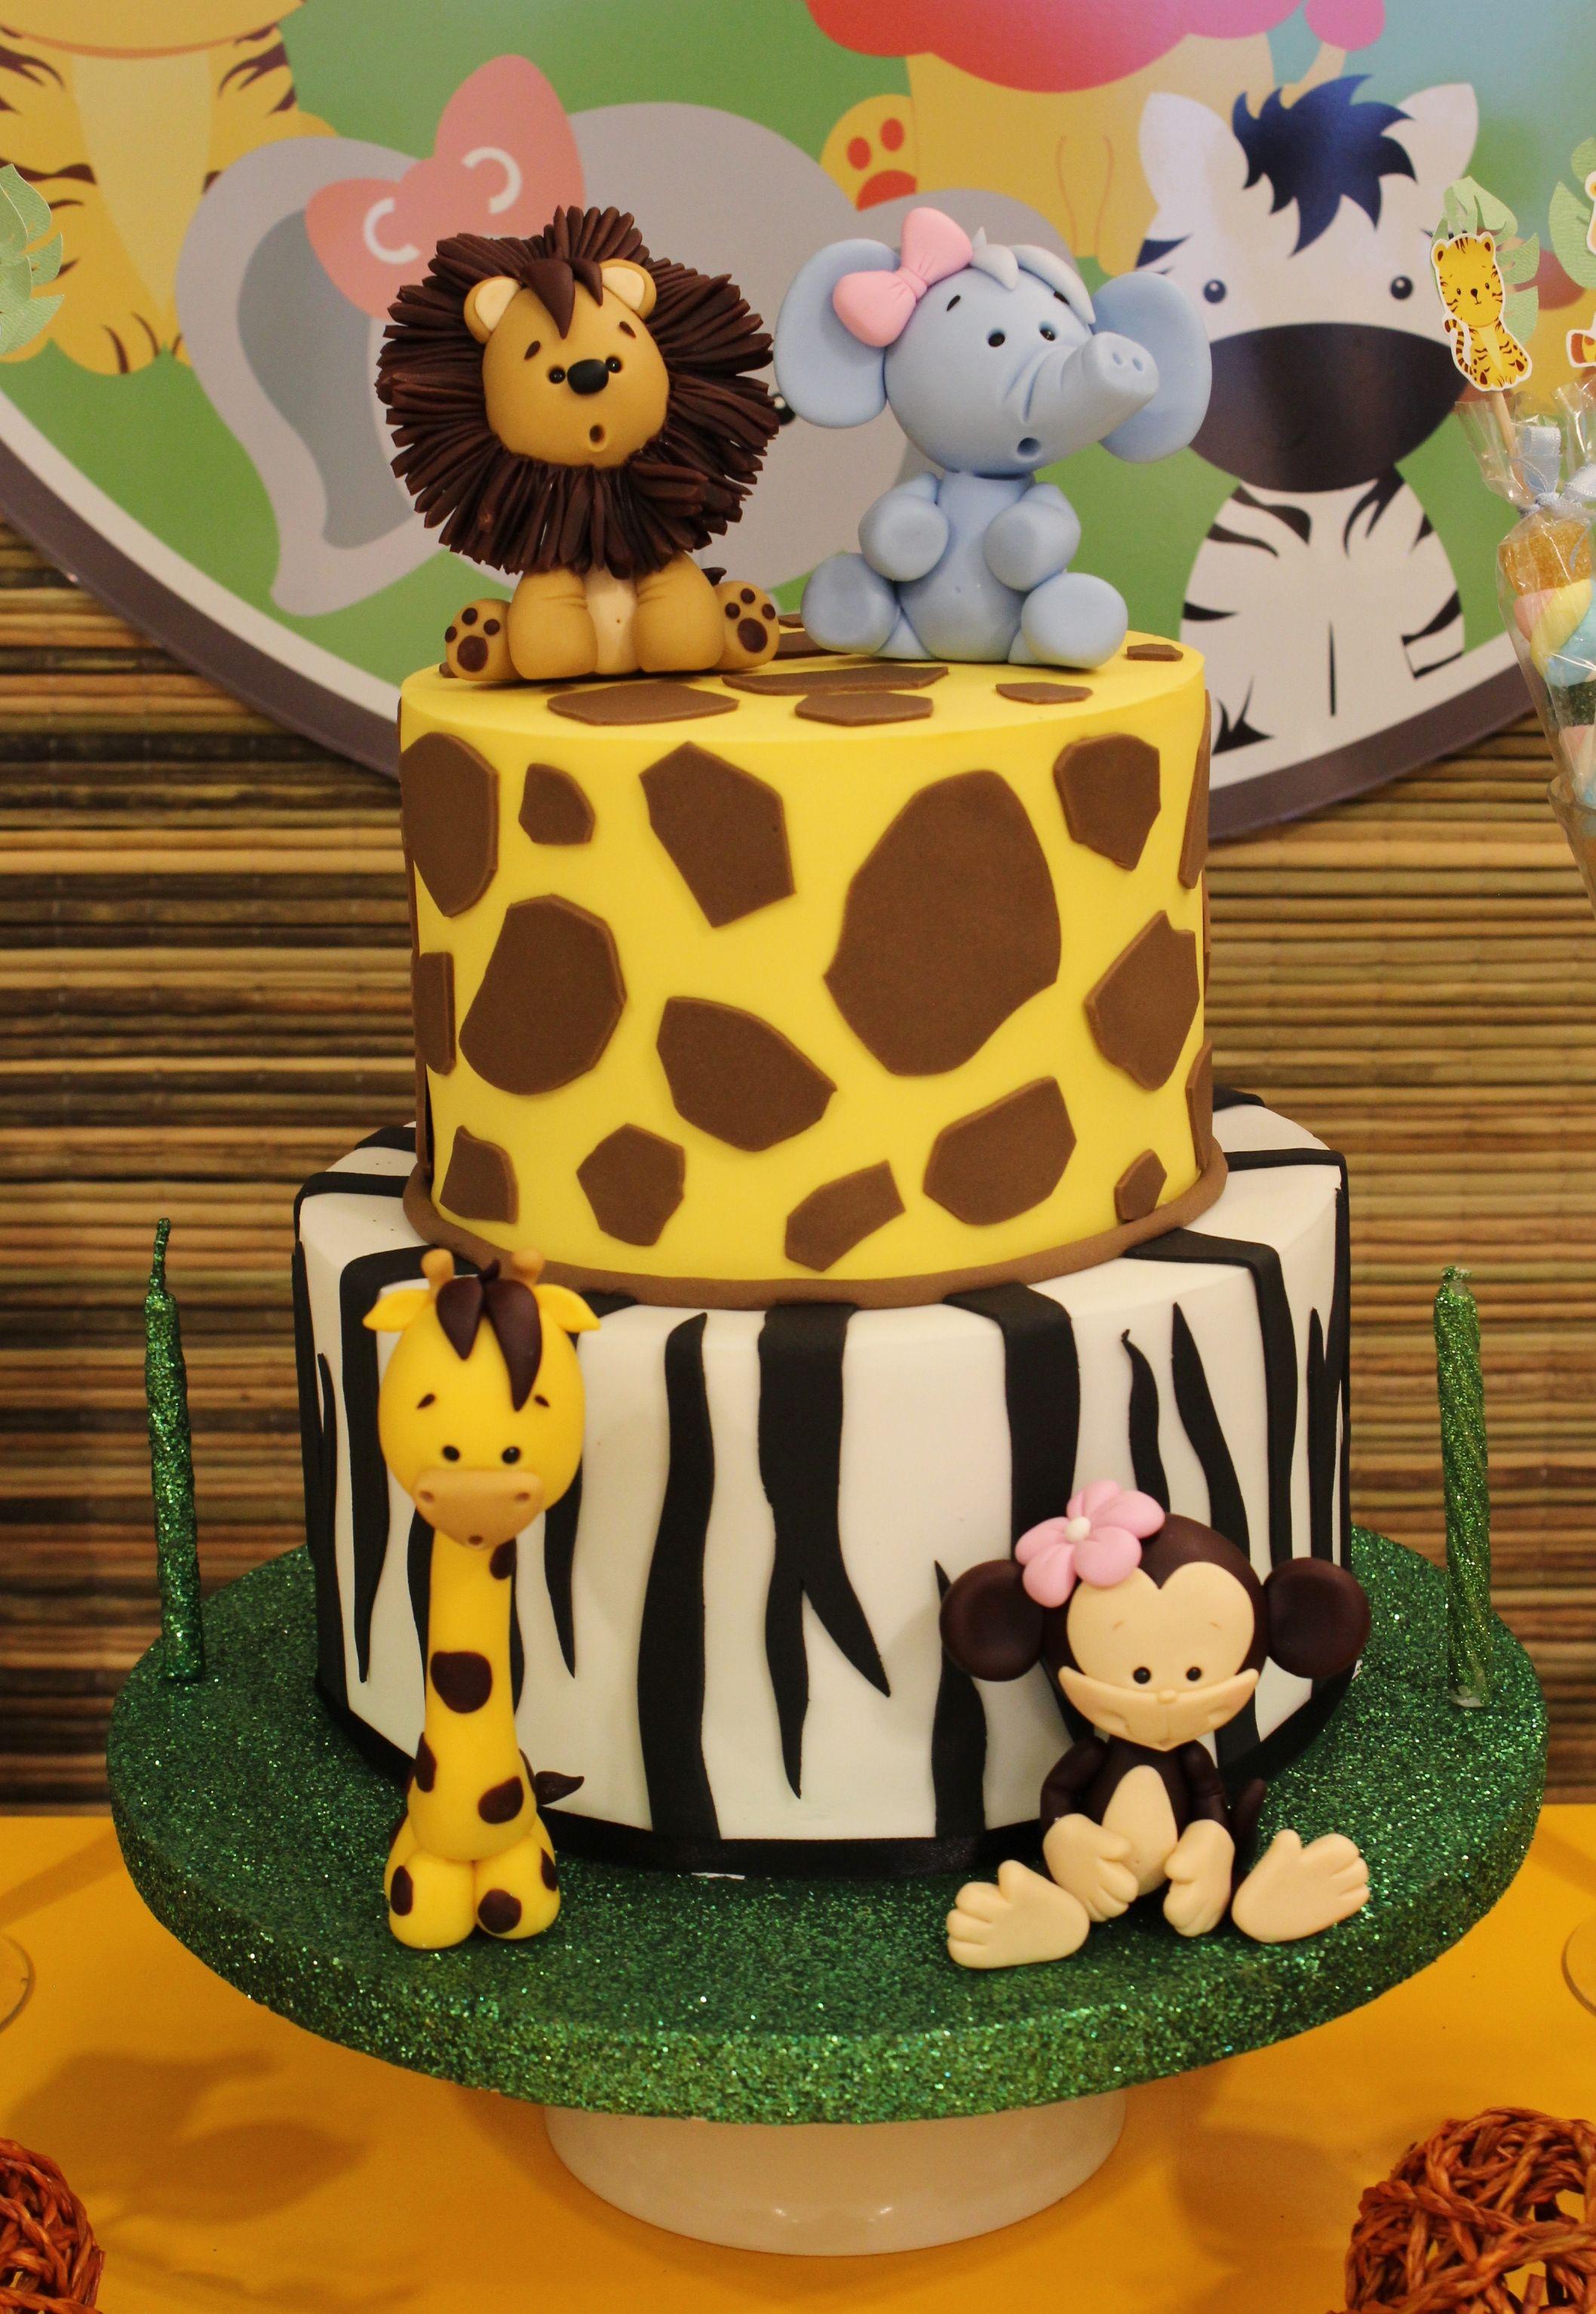 Violeta Glace Tortas de cumpleaños de la selva, Pasteles